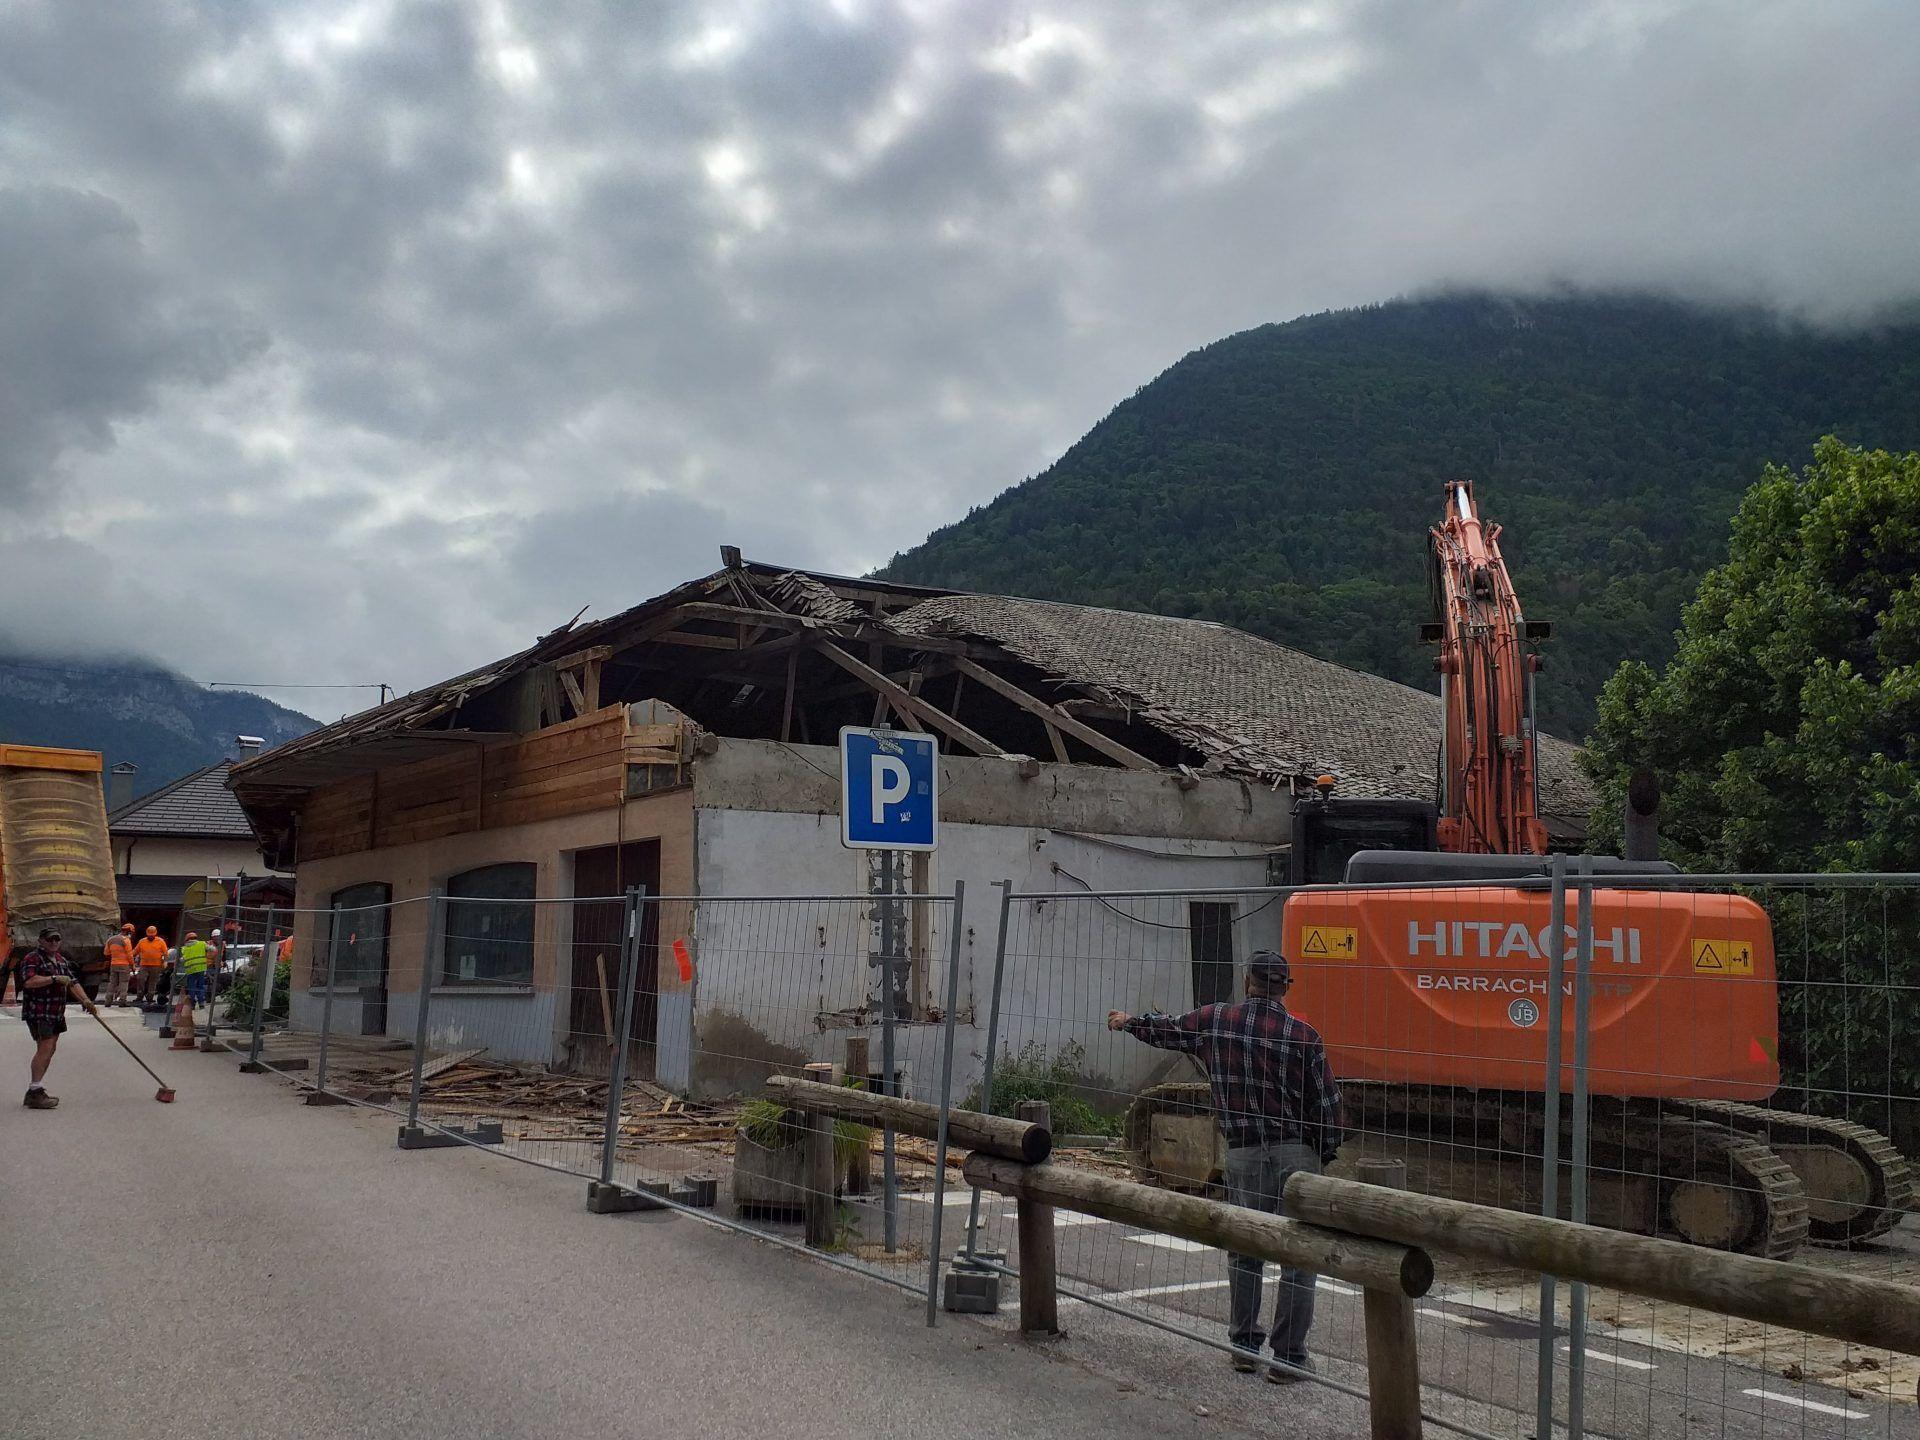 Démolition bar - La Balme de Thuy - Barrachin BTP